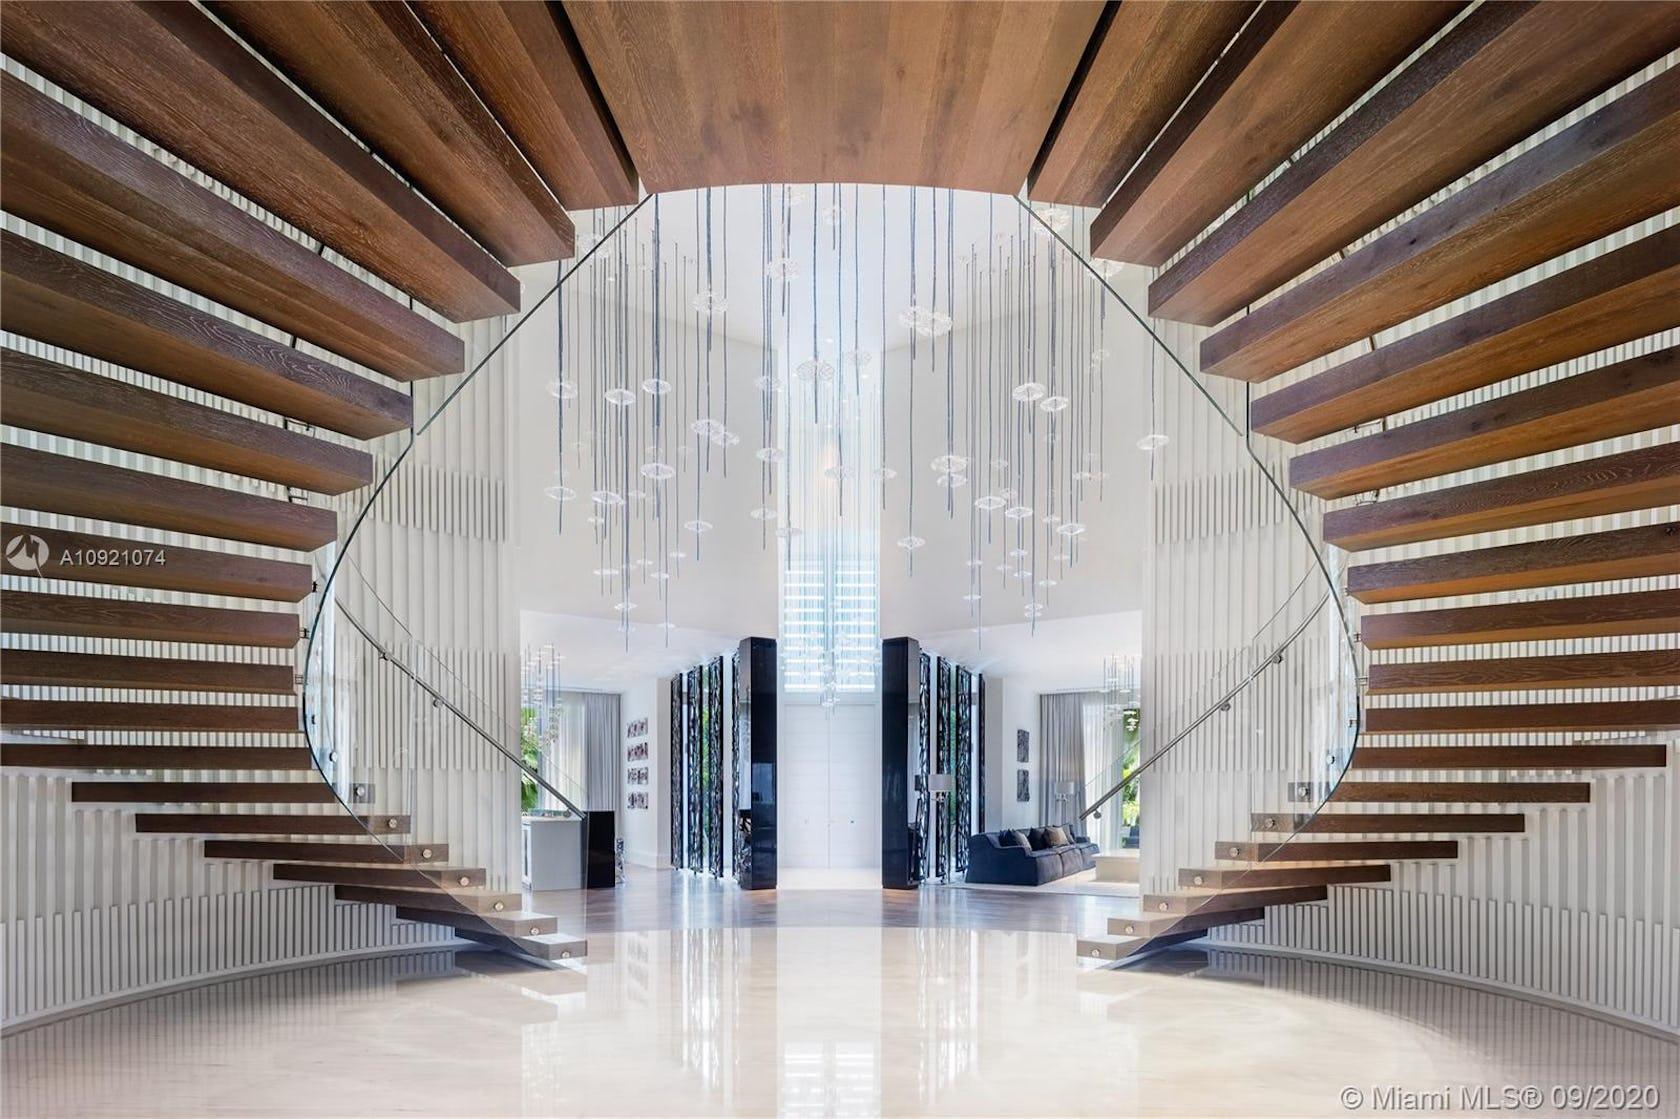 lobby indoors room staircase interior design handrail banister